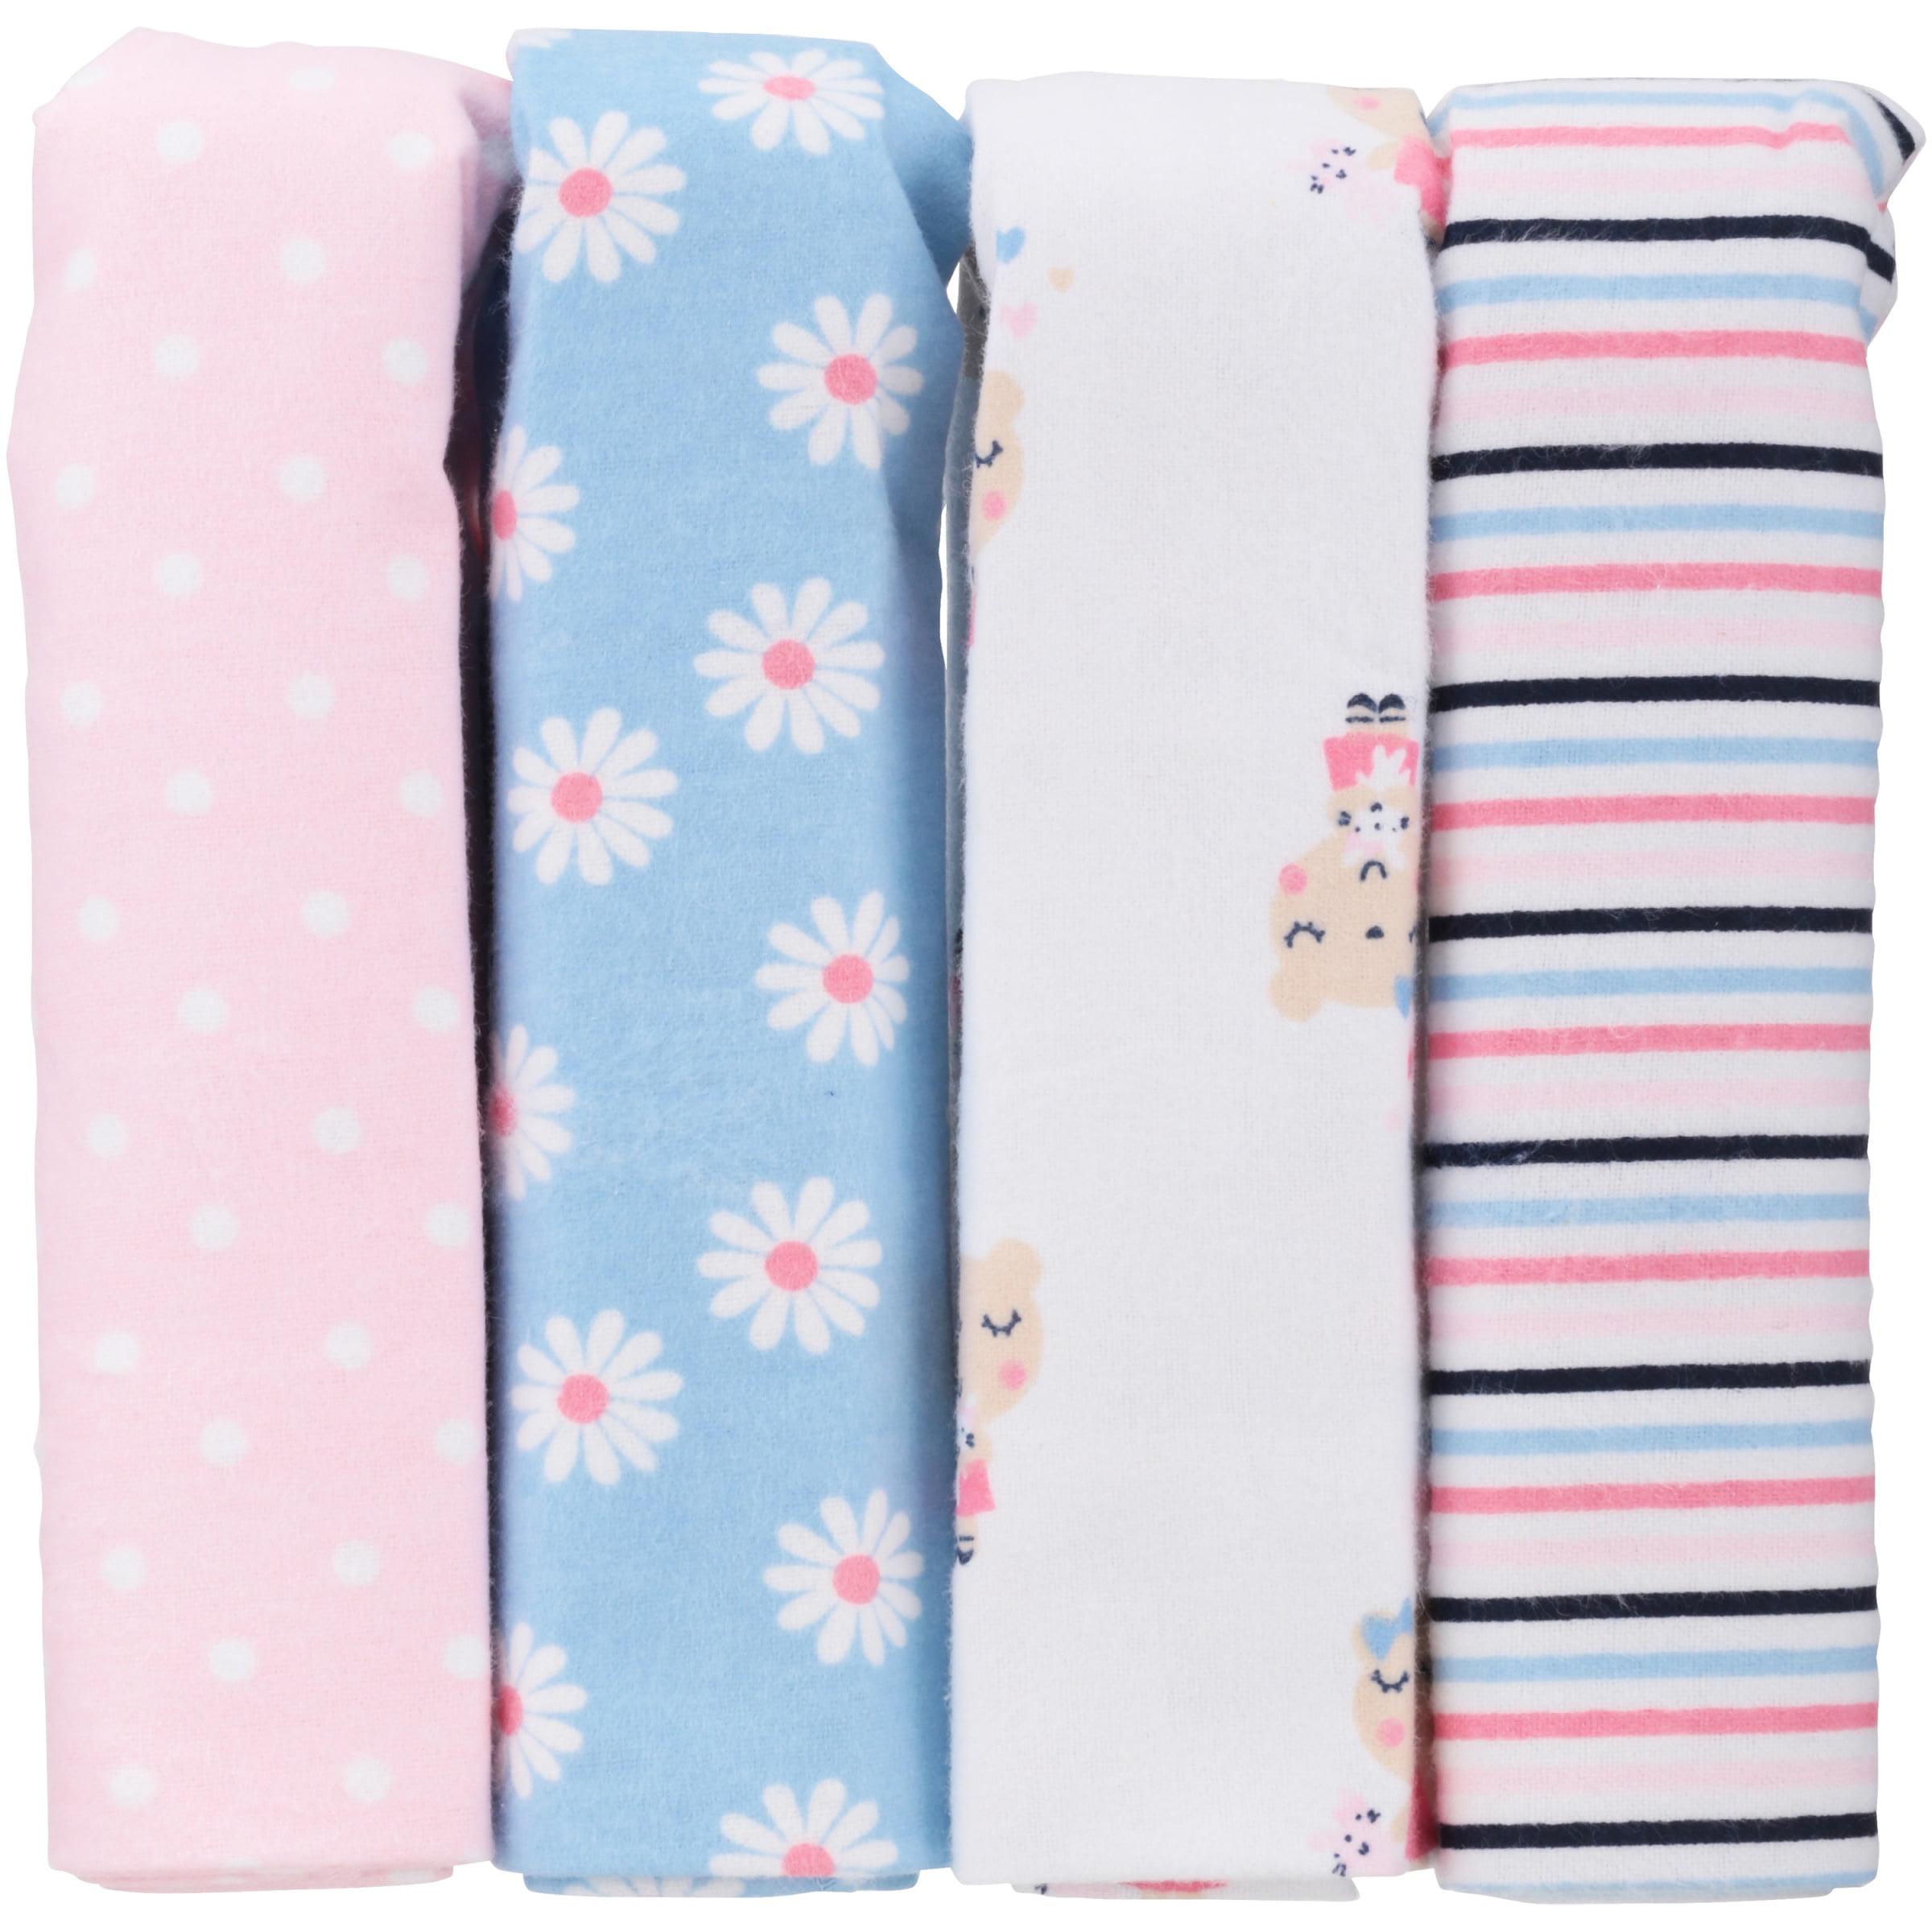 Swaddle Blanket Flannel Swaddle Coral Floral Blankets Receiving Blanket Baby Blanket 2 Pack Receiving Blanket Flannel Blanket